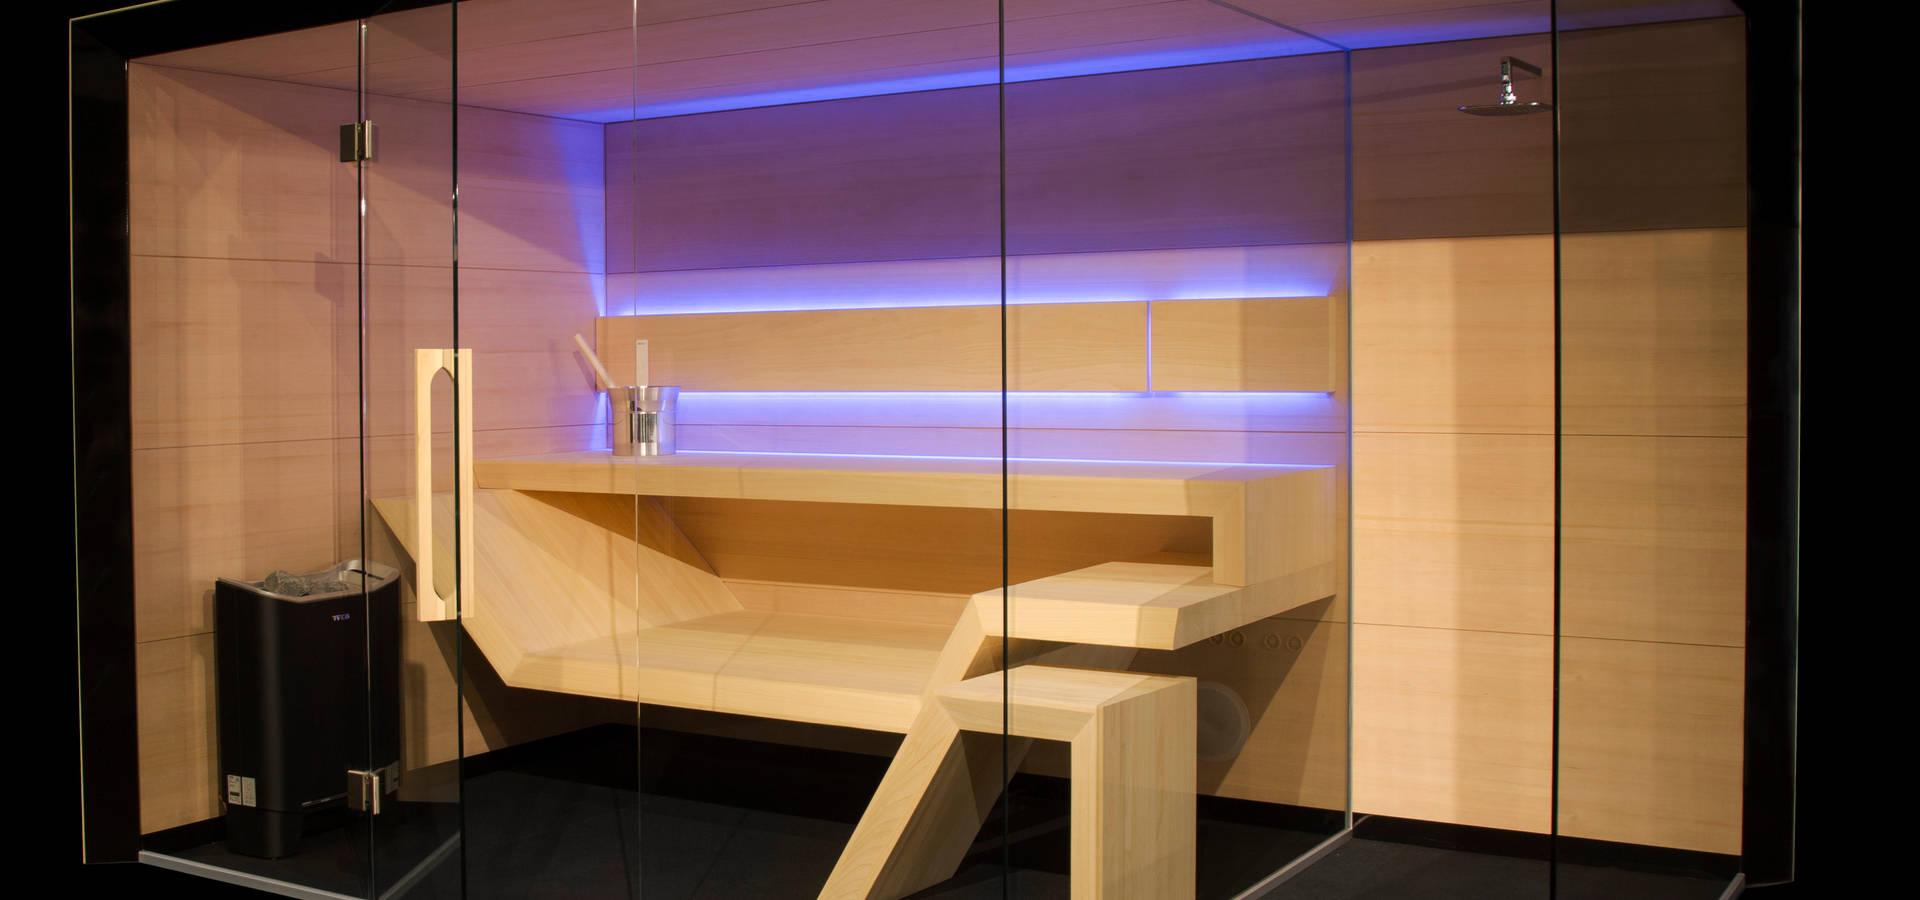 Sauna modern design  Sauna Modern Line von Sauna Line Sp. z o.o. | homify